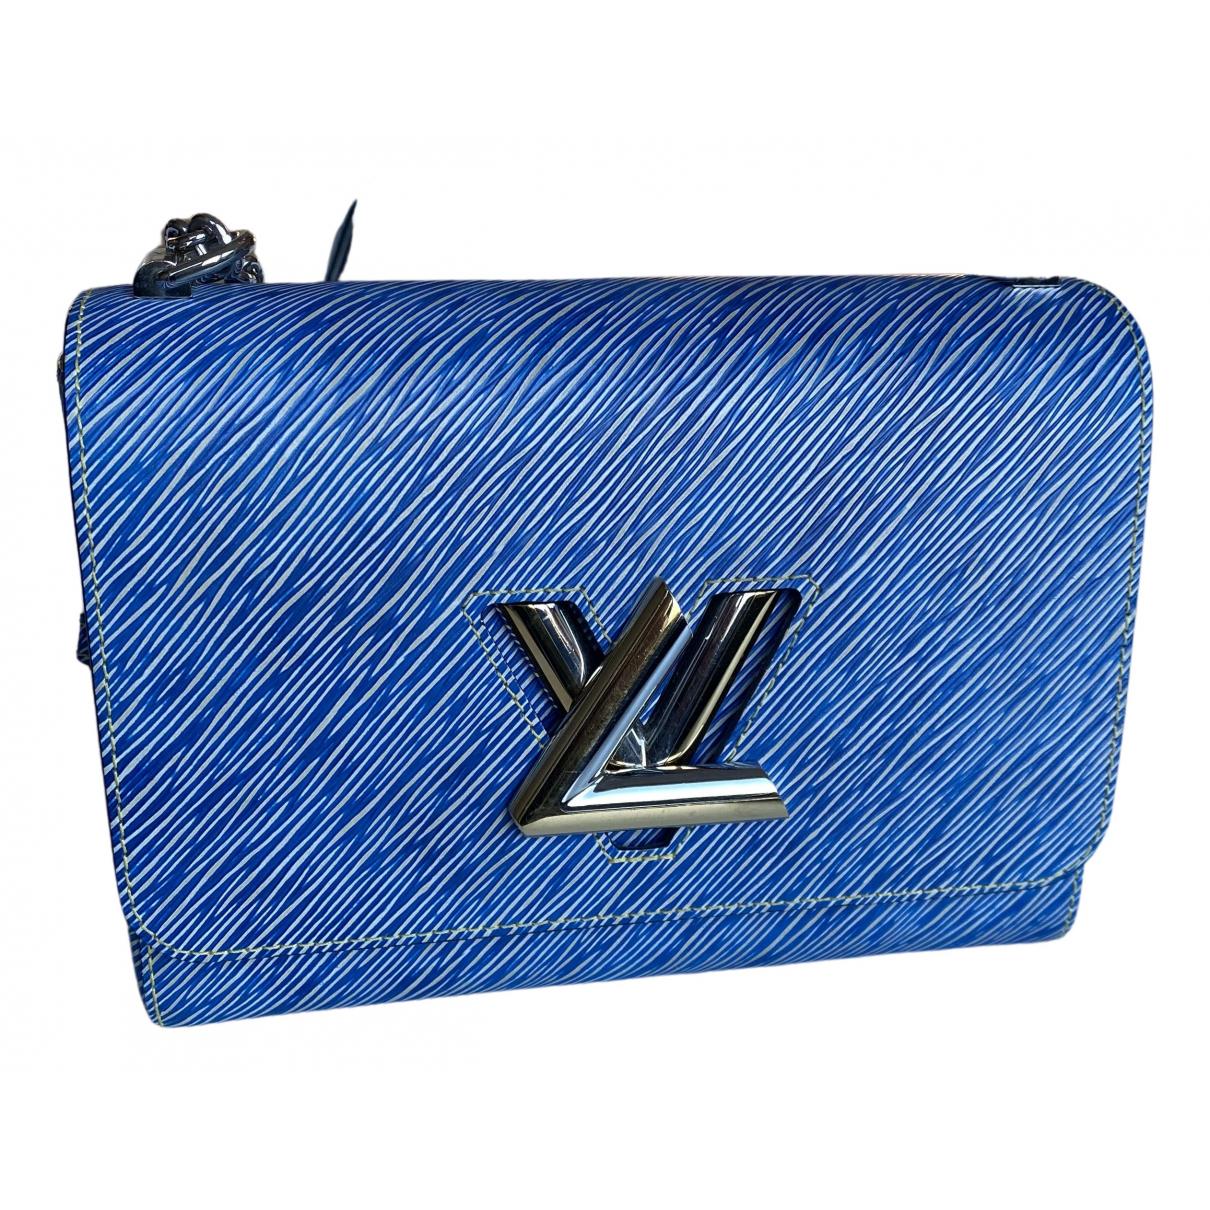 Louis Vuitton - Sac a main Twist pour femme en cuir - bleu